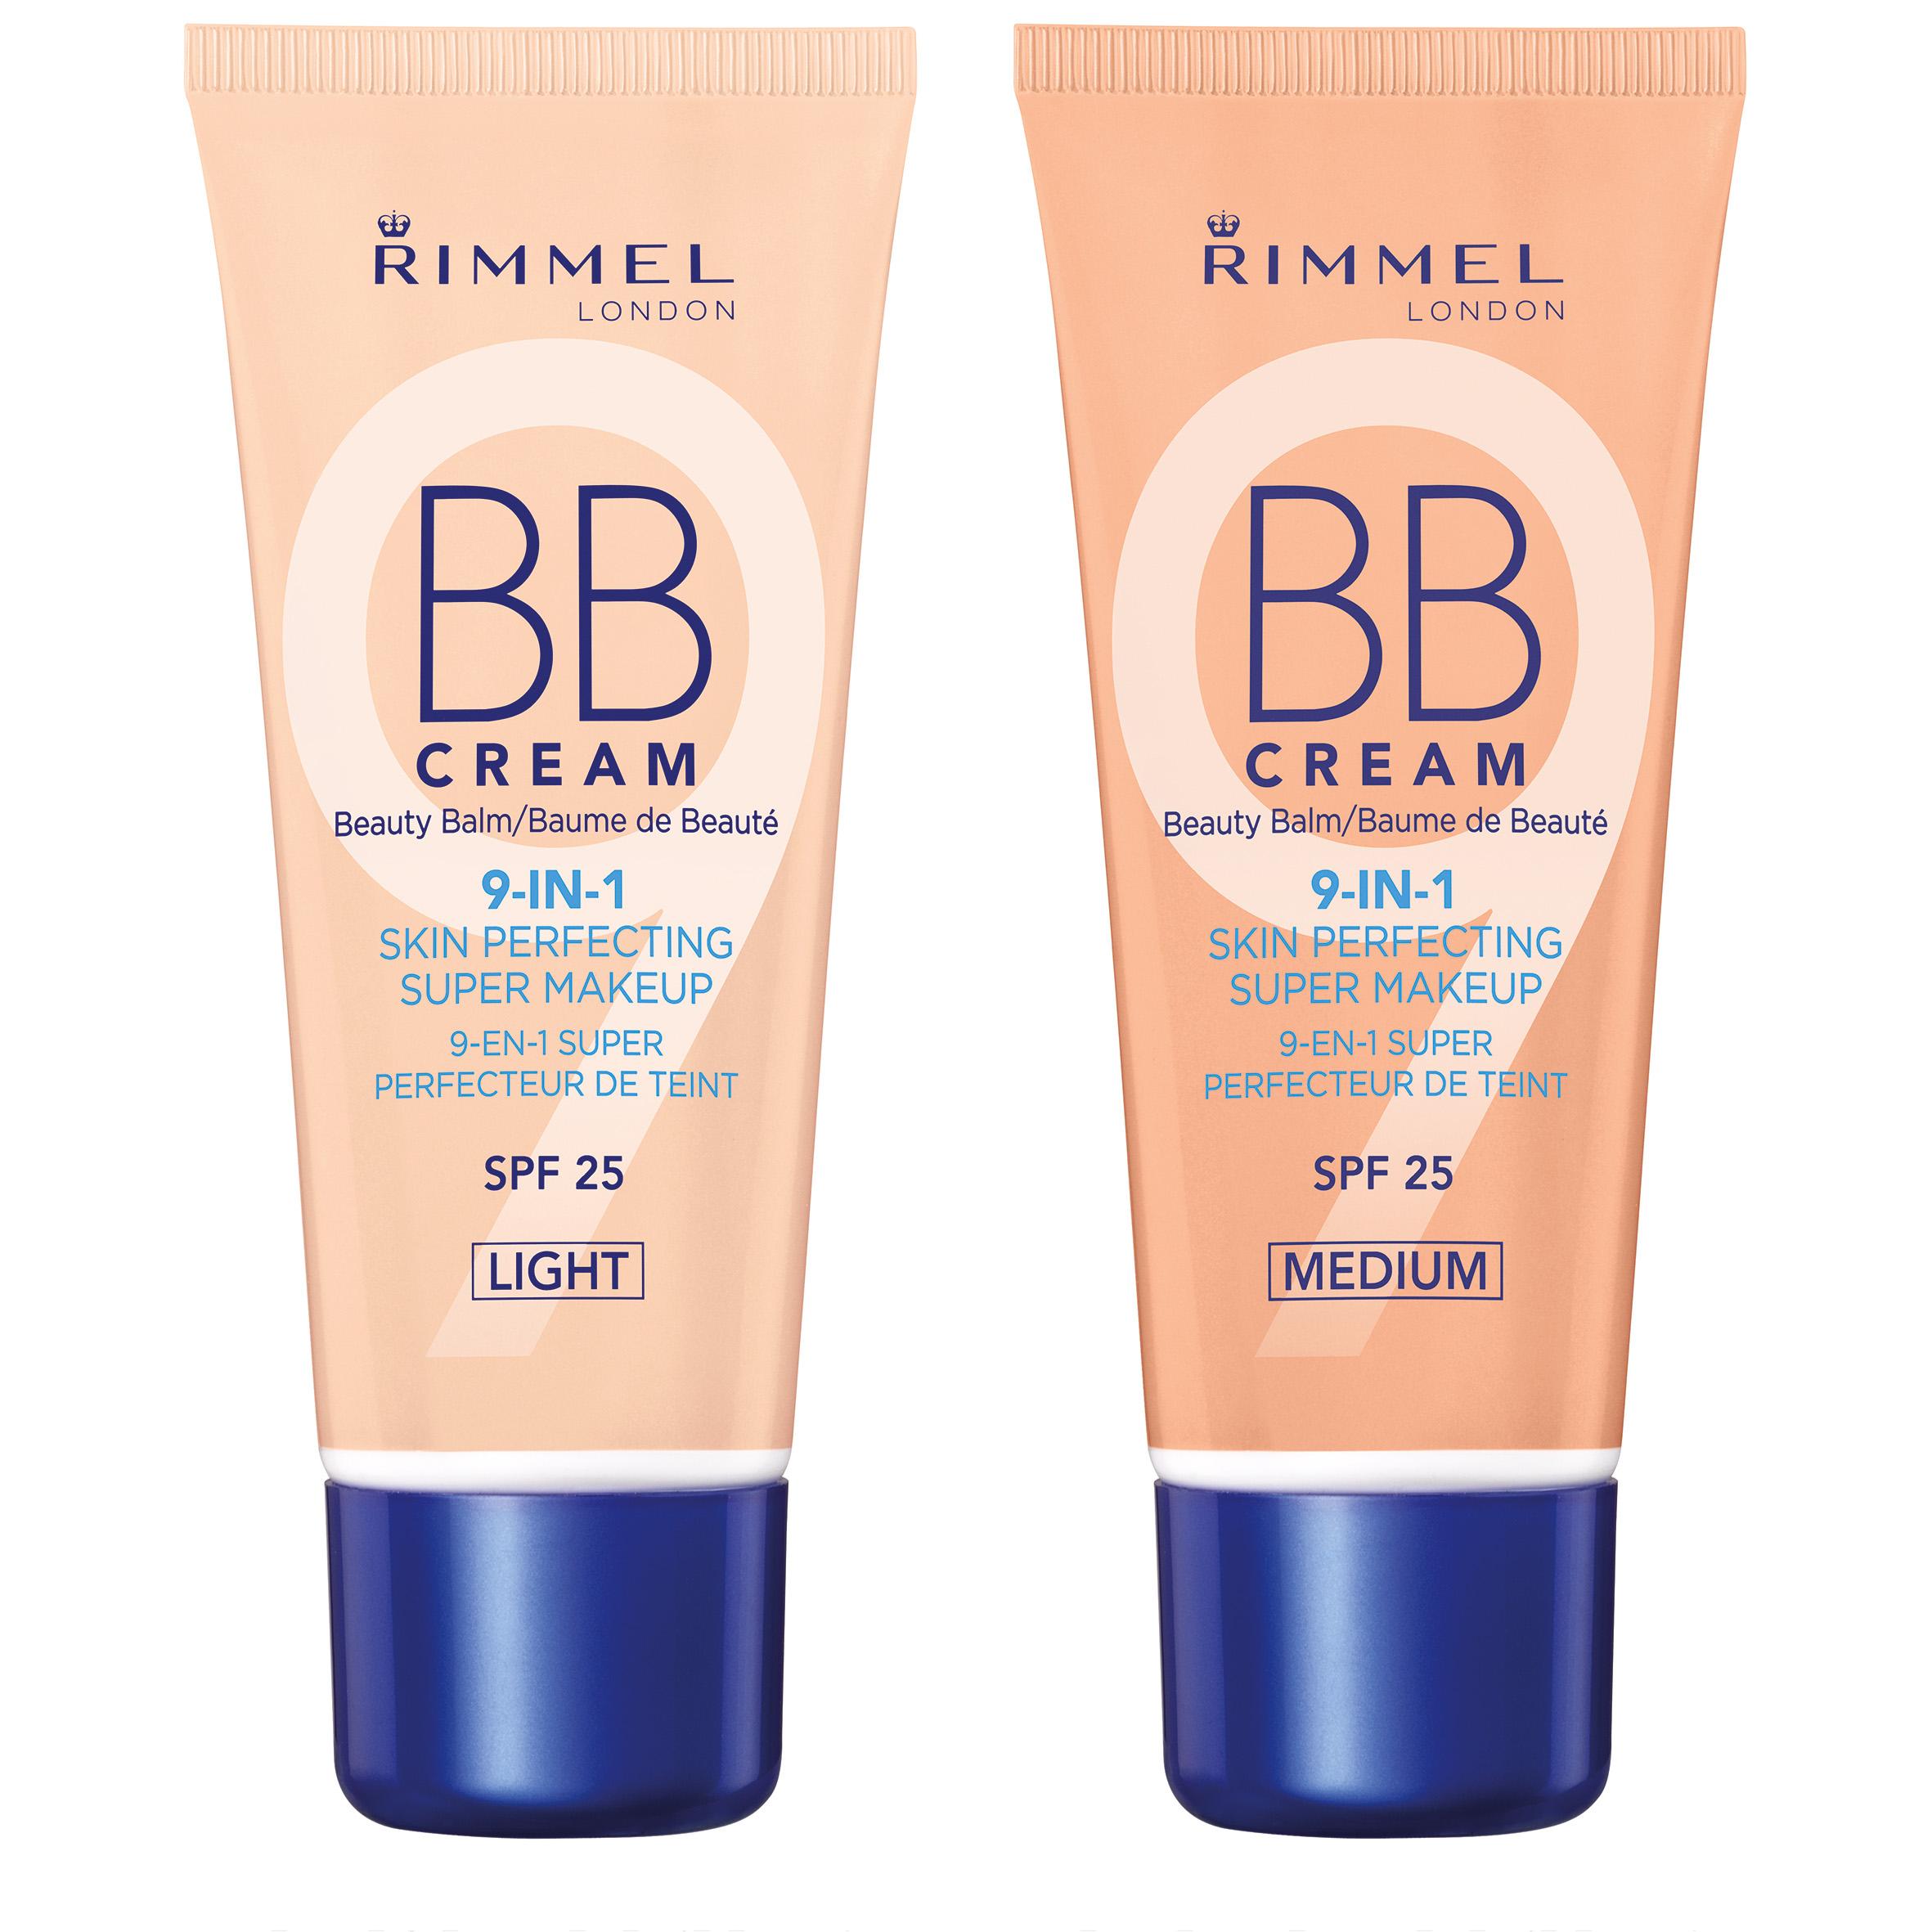 BB Cream Rimmel